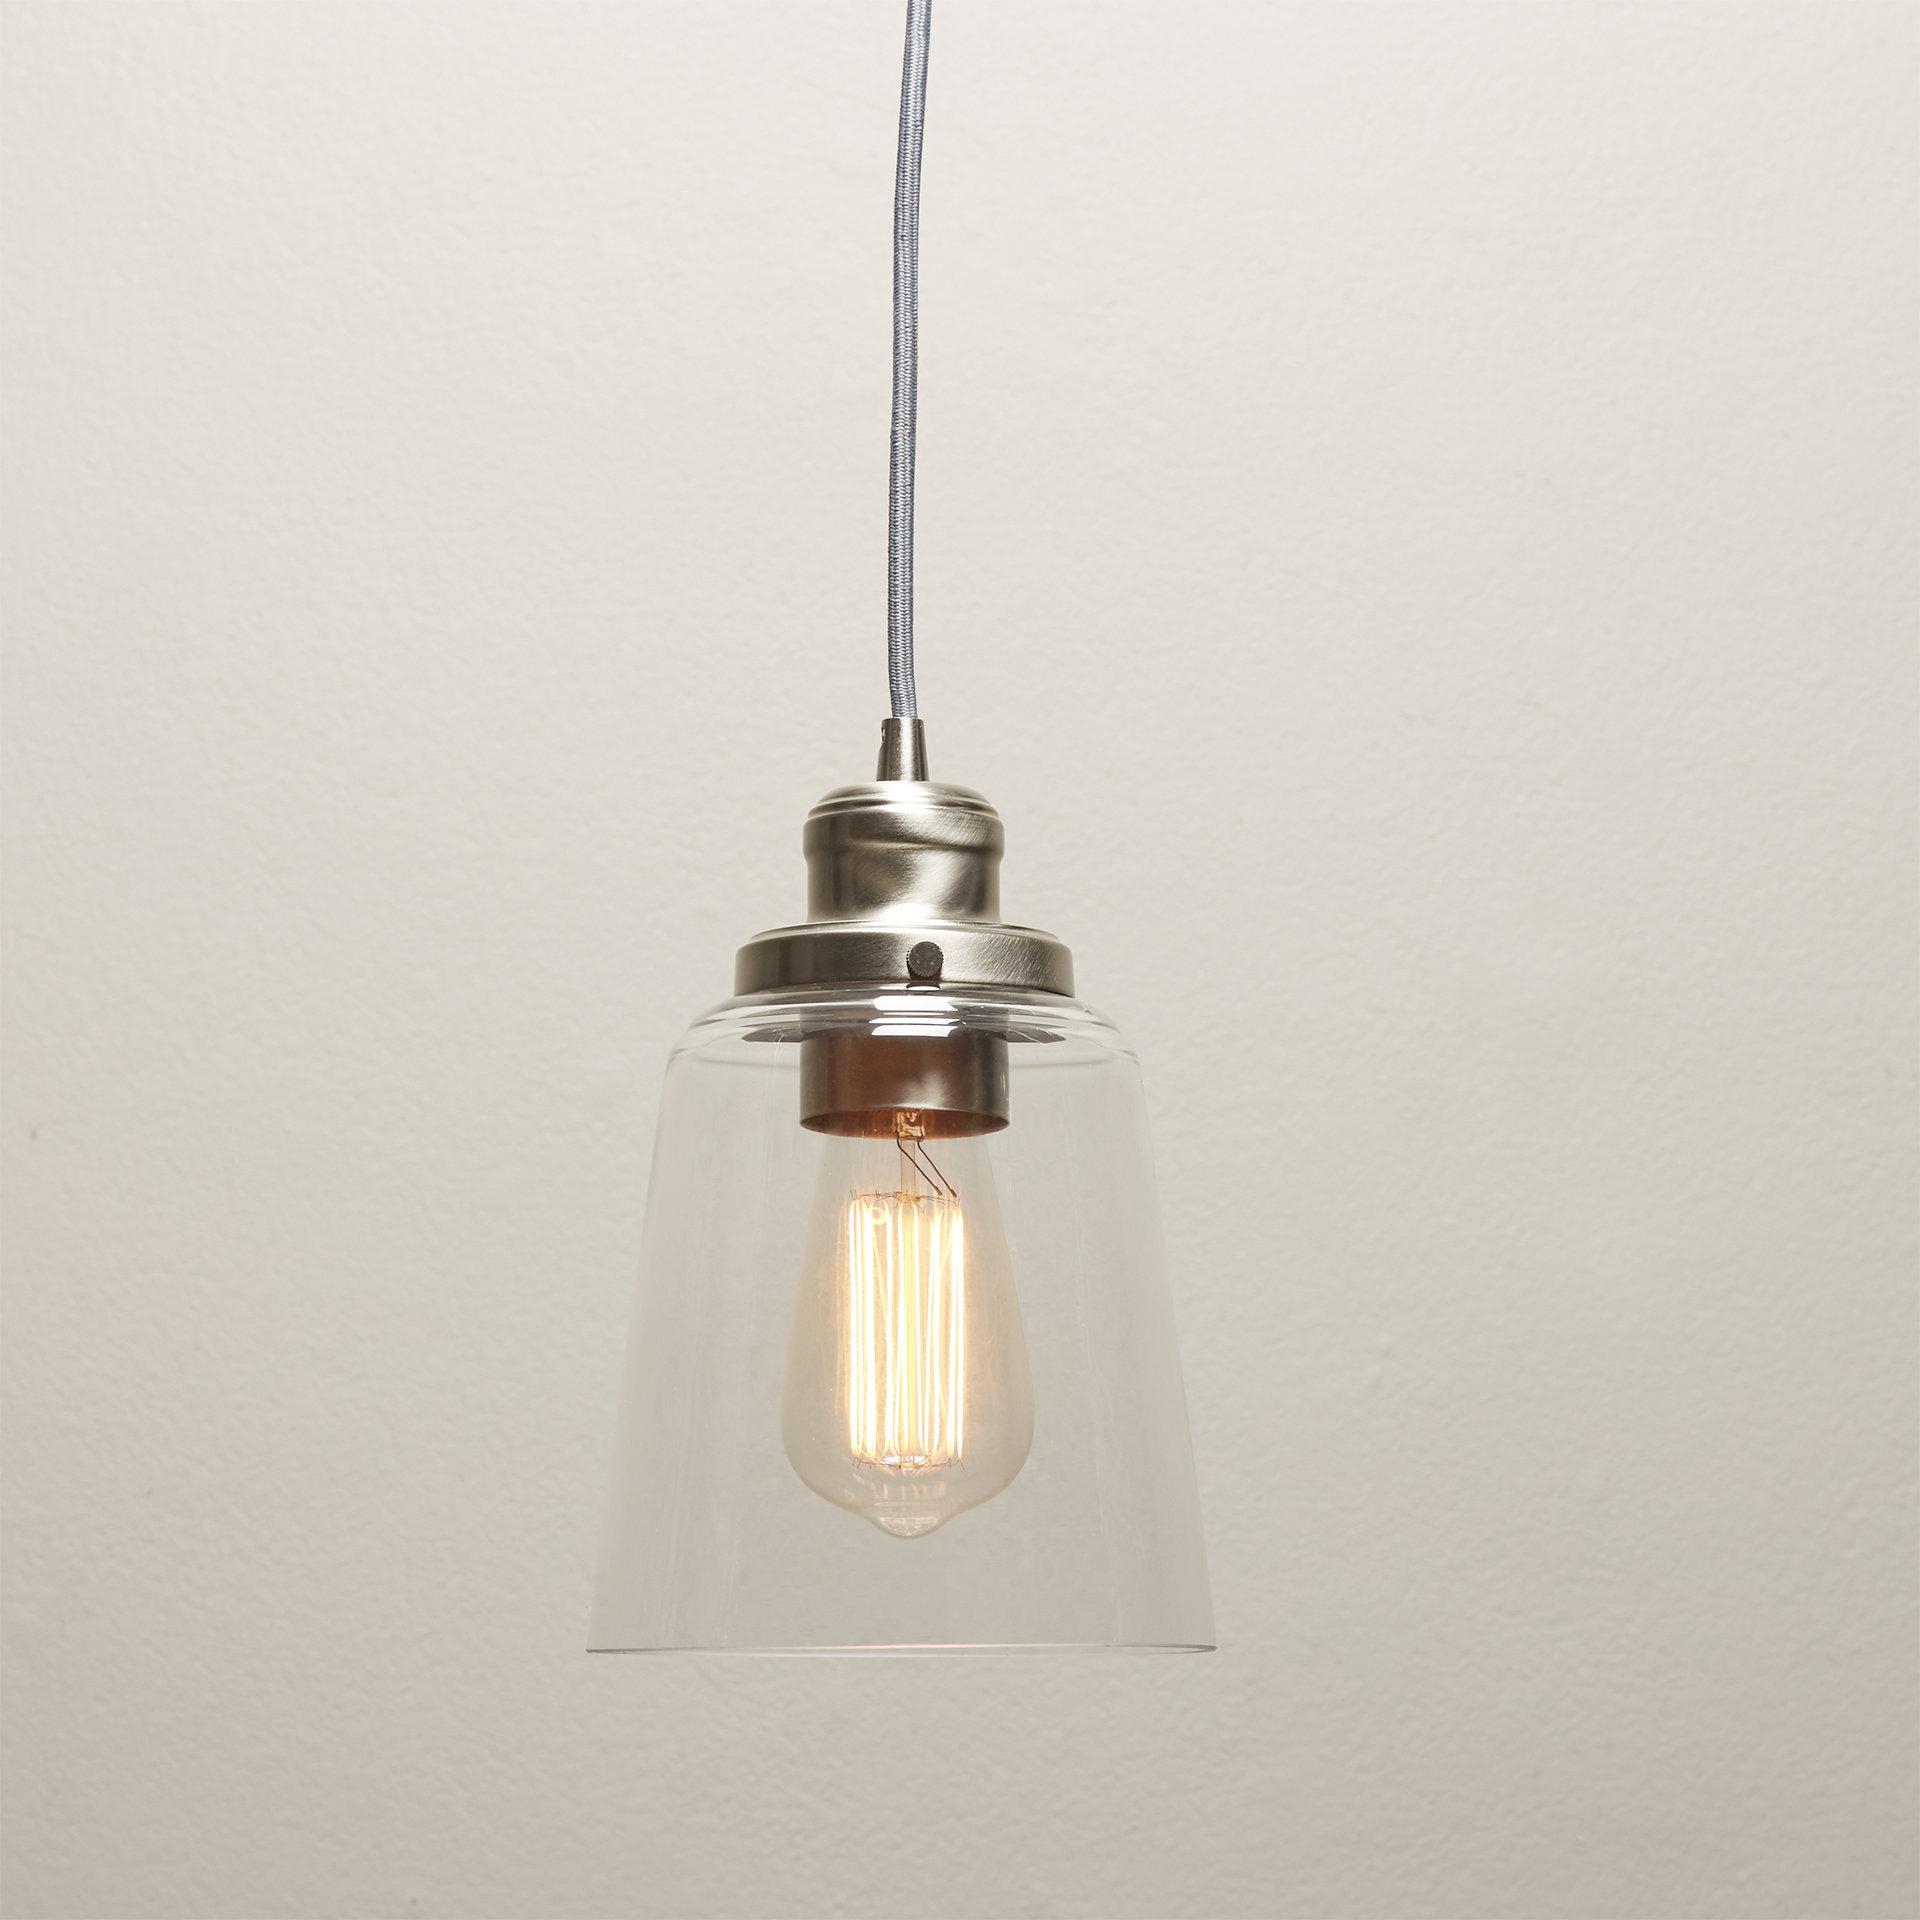 Most Popular Roslindale 1 Light Single Bell Pendants Within 1 Light Single Bell Pendant (Gallery 4 of 20)